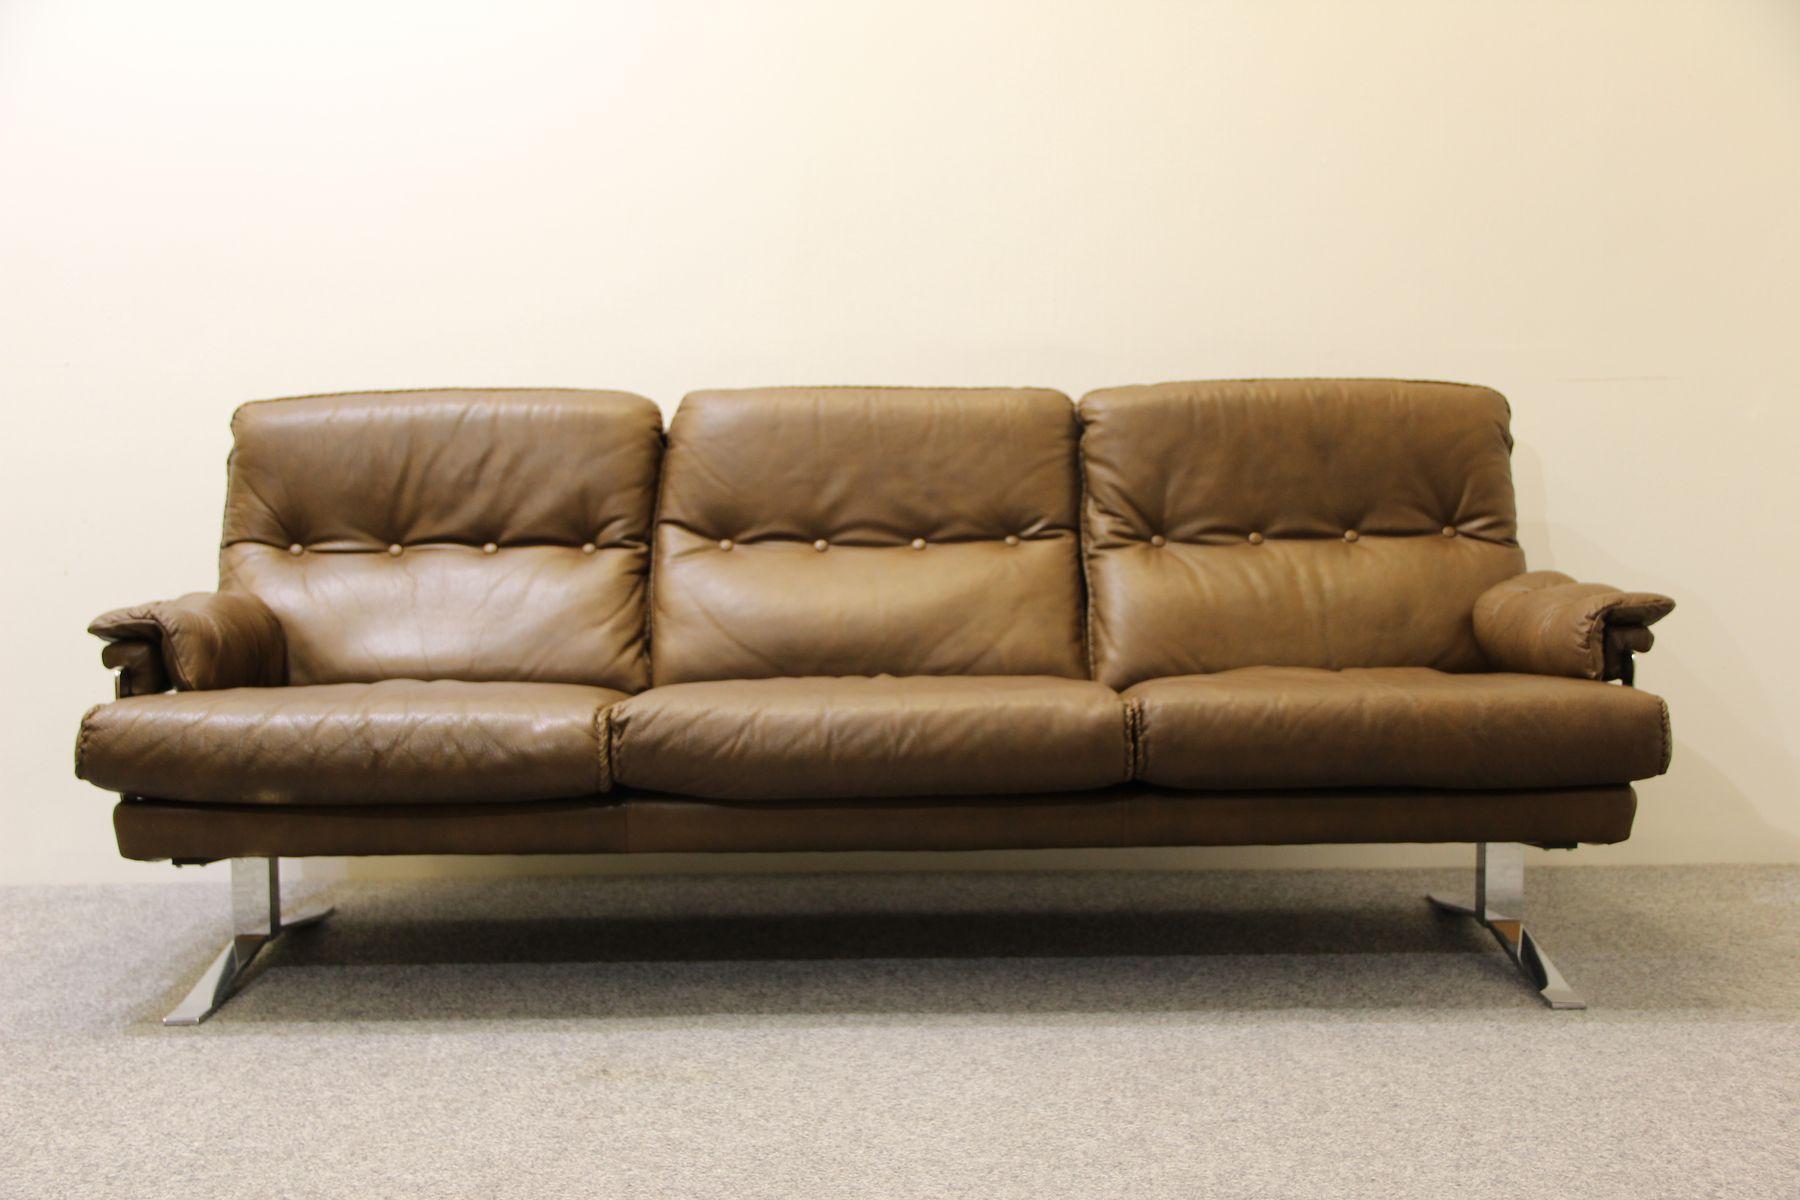 Danish Brown Buffalo Leather Sofa Arne Norell for sale at Pamono